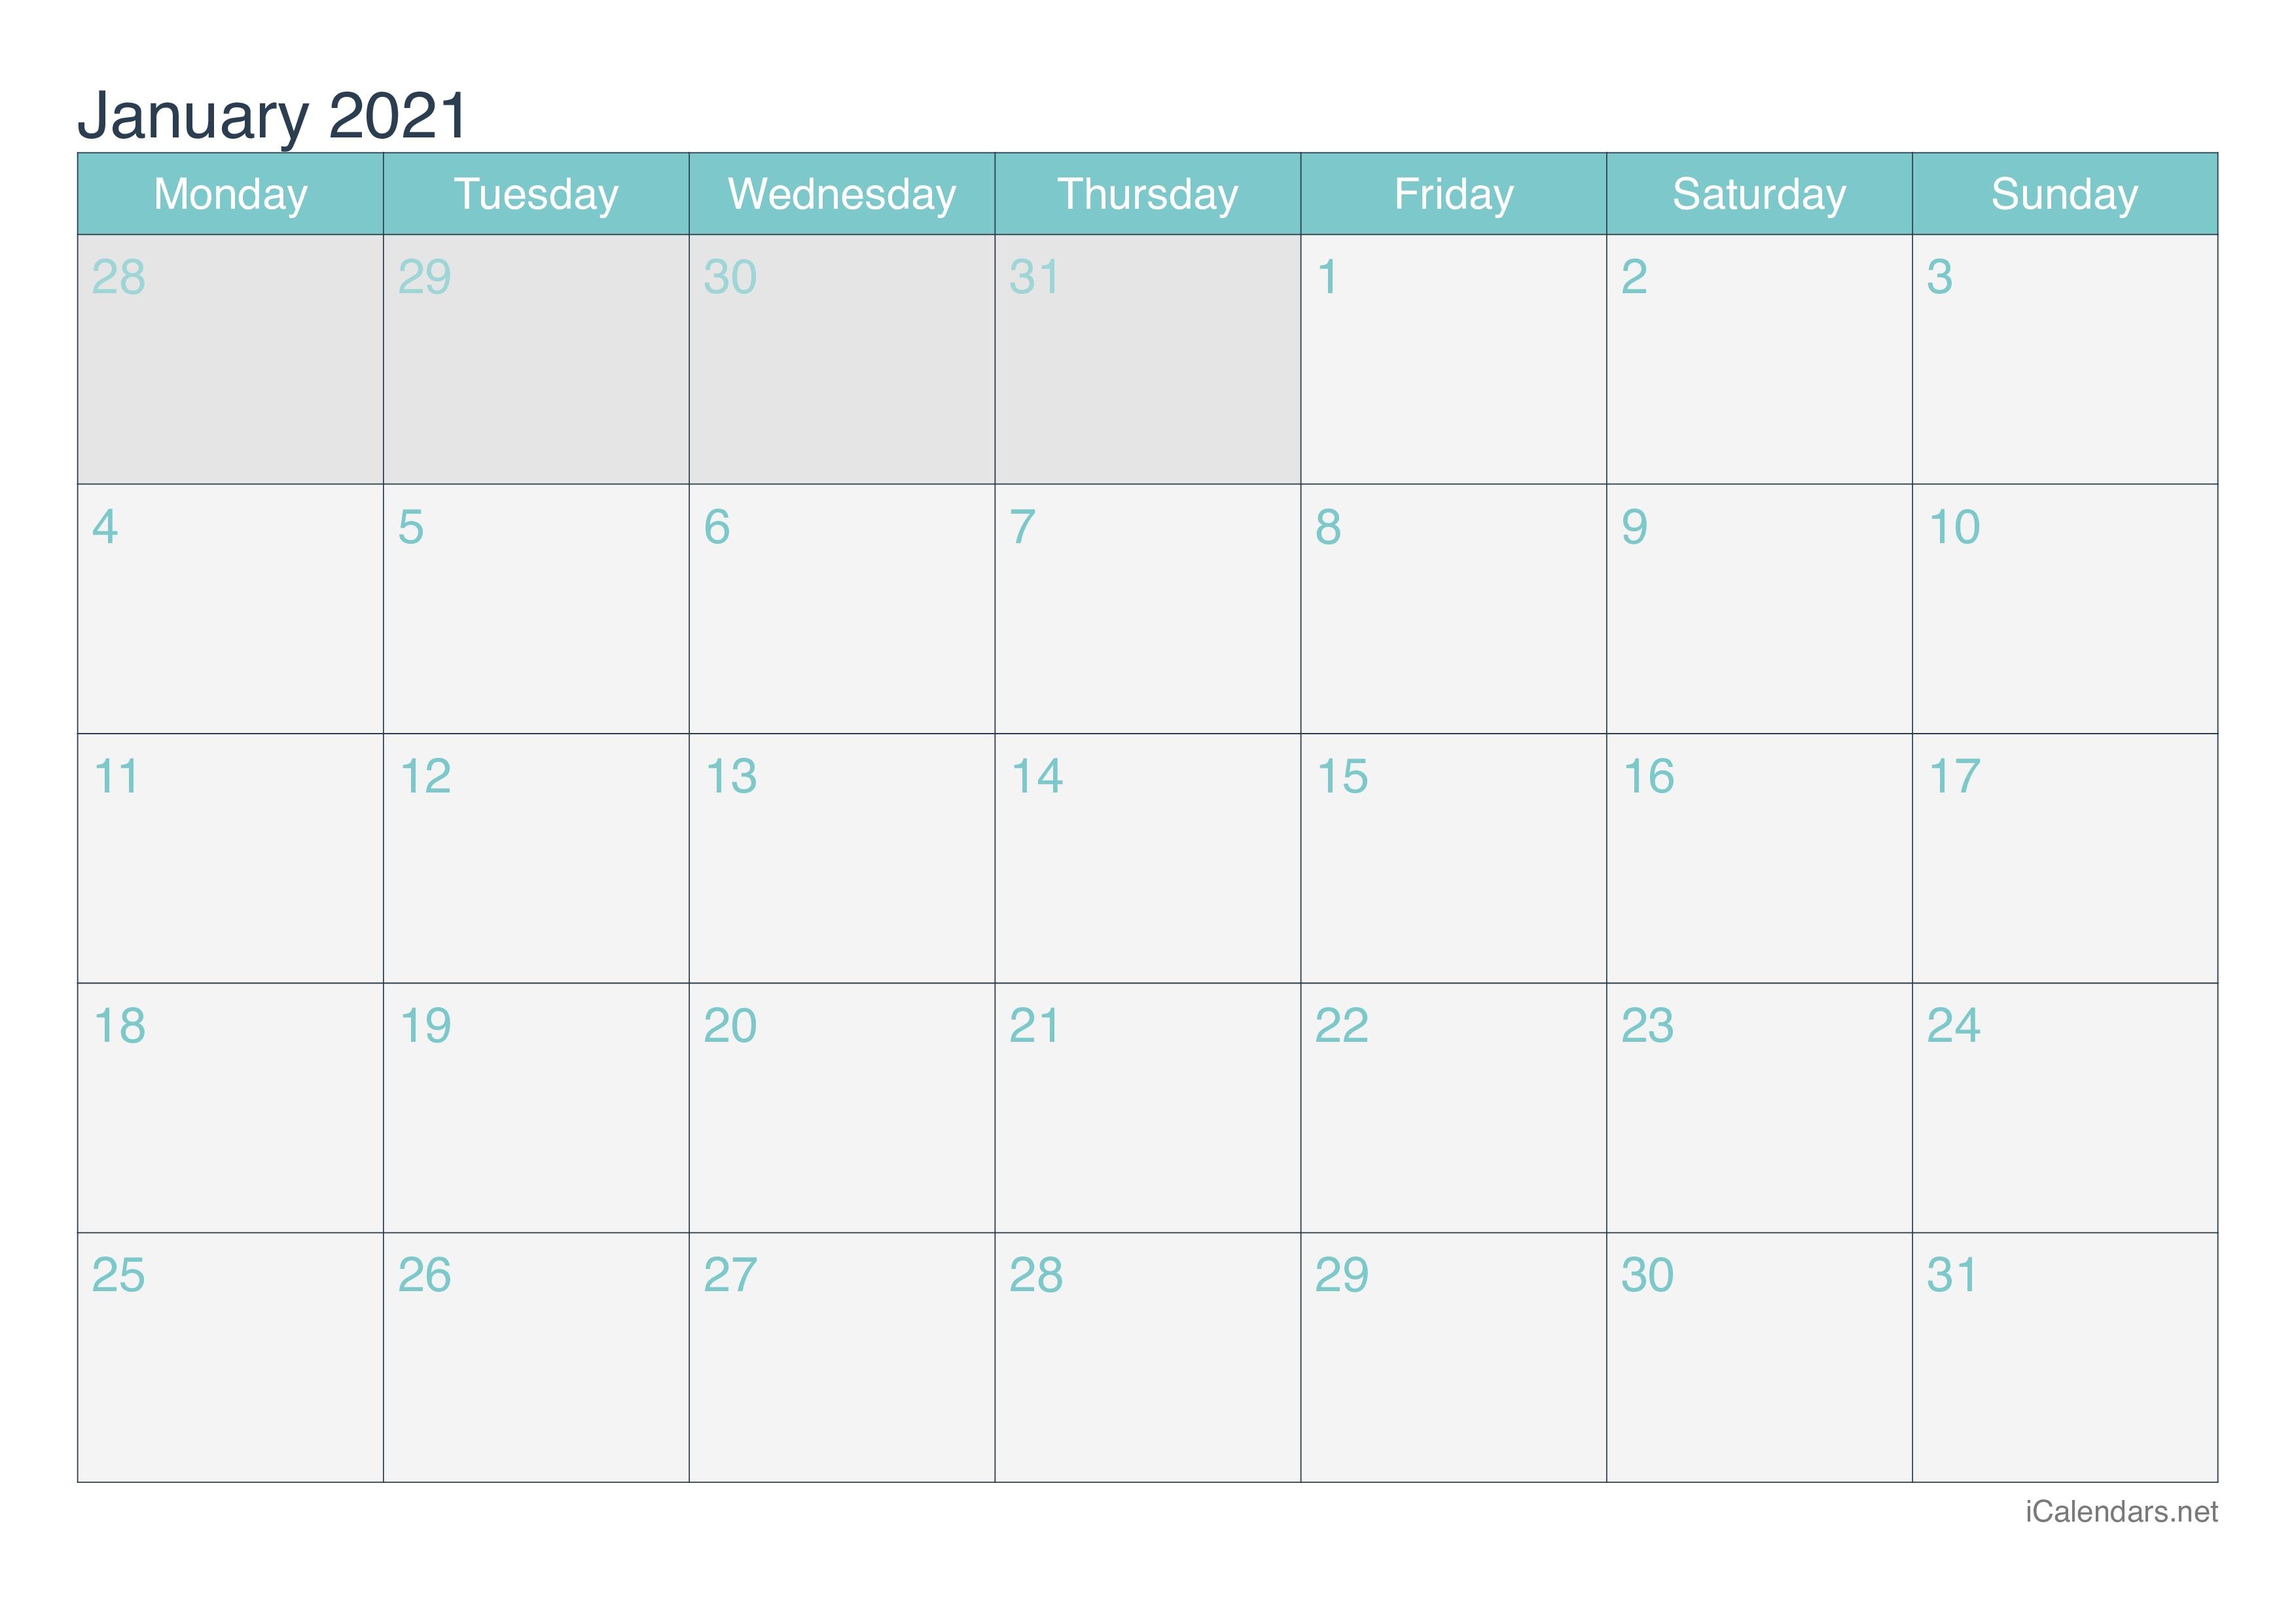 January 2021 Printable Calendar - Icalendars Printable January Through December 2021 Calendar